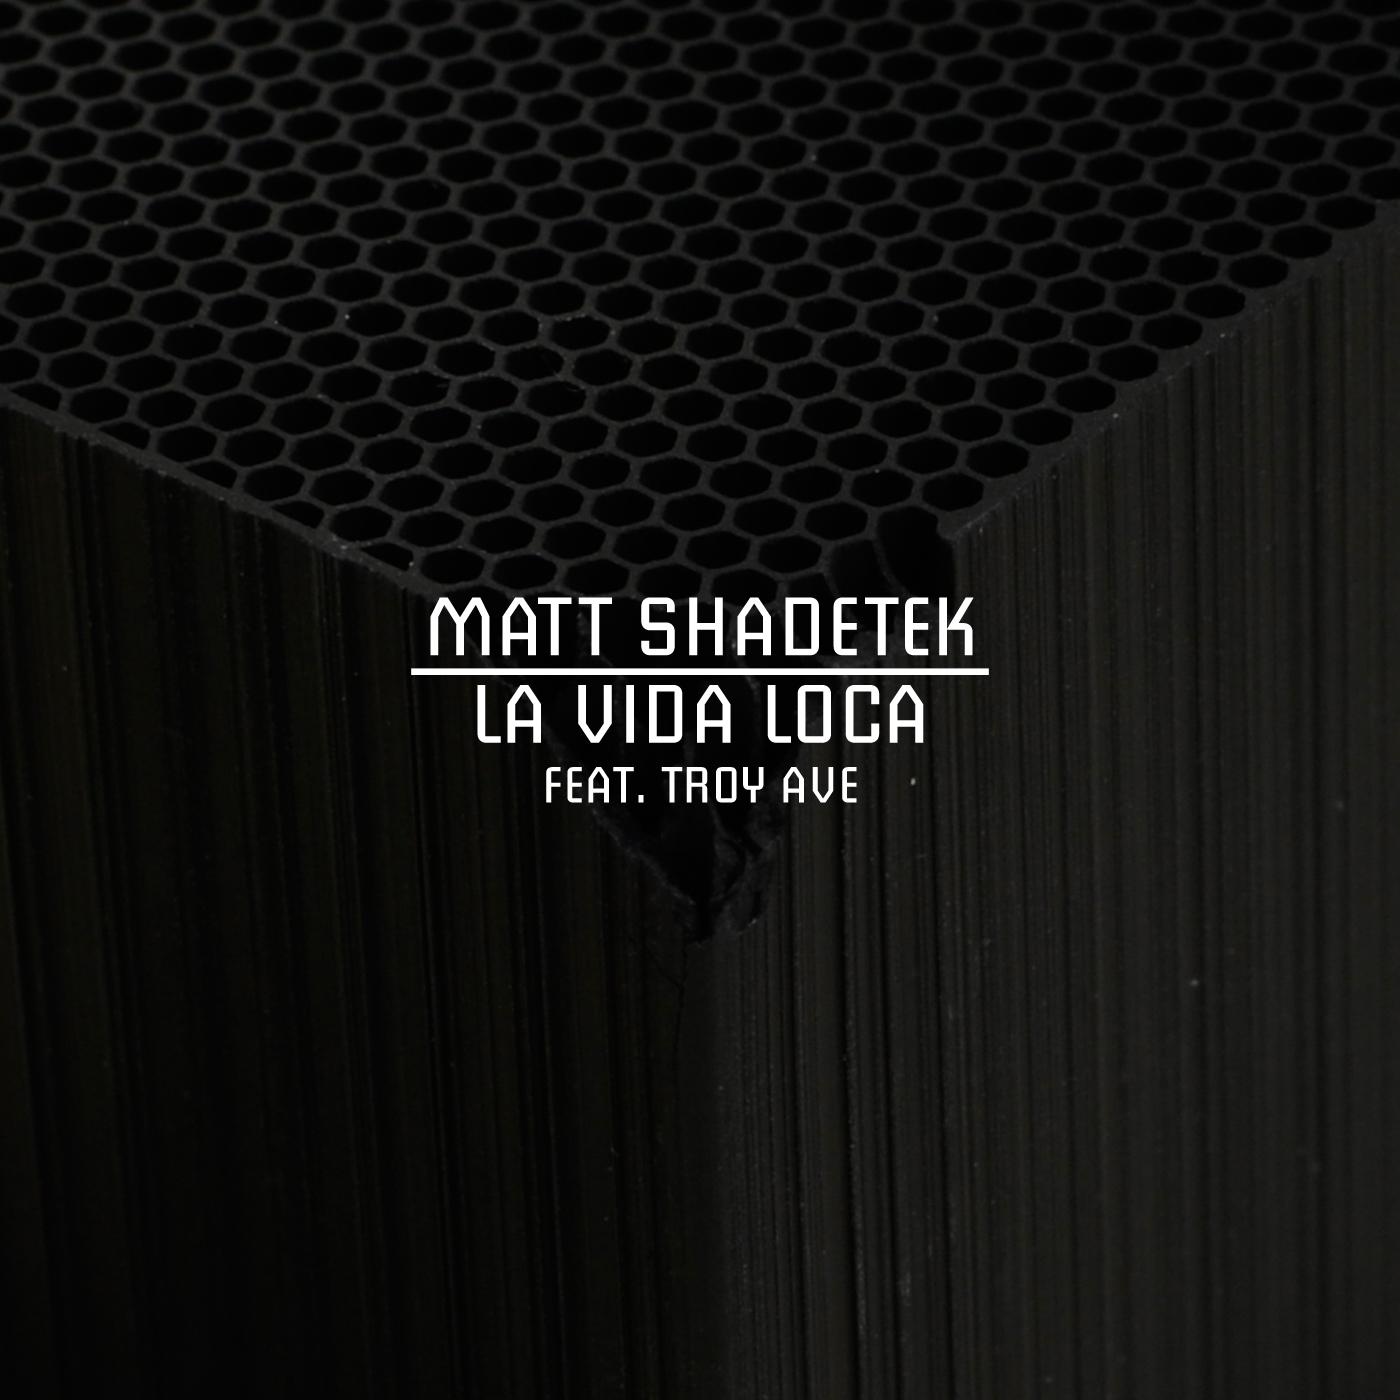 Matt Shadetek feat. Troy Ave. - La Vida Loca